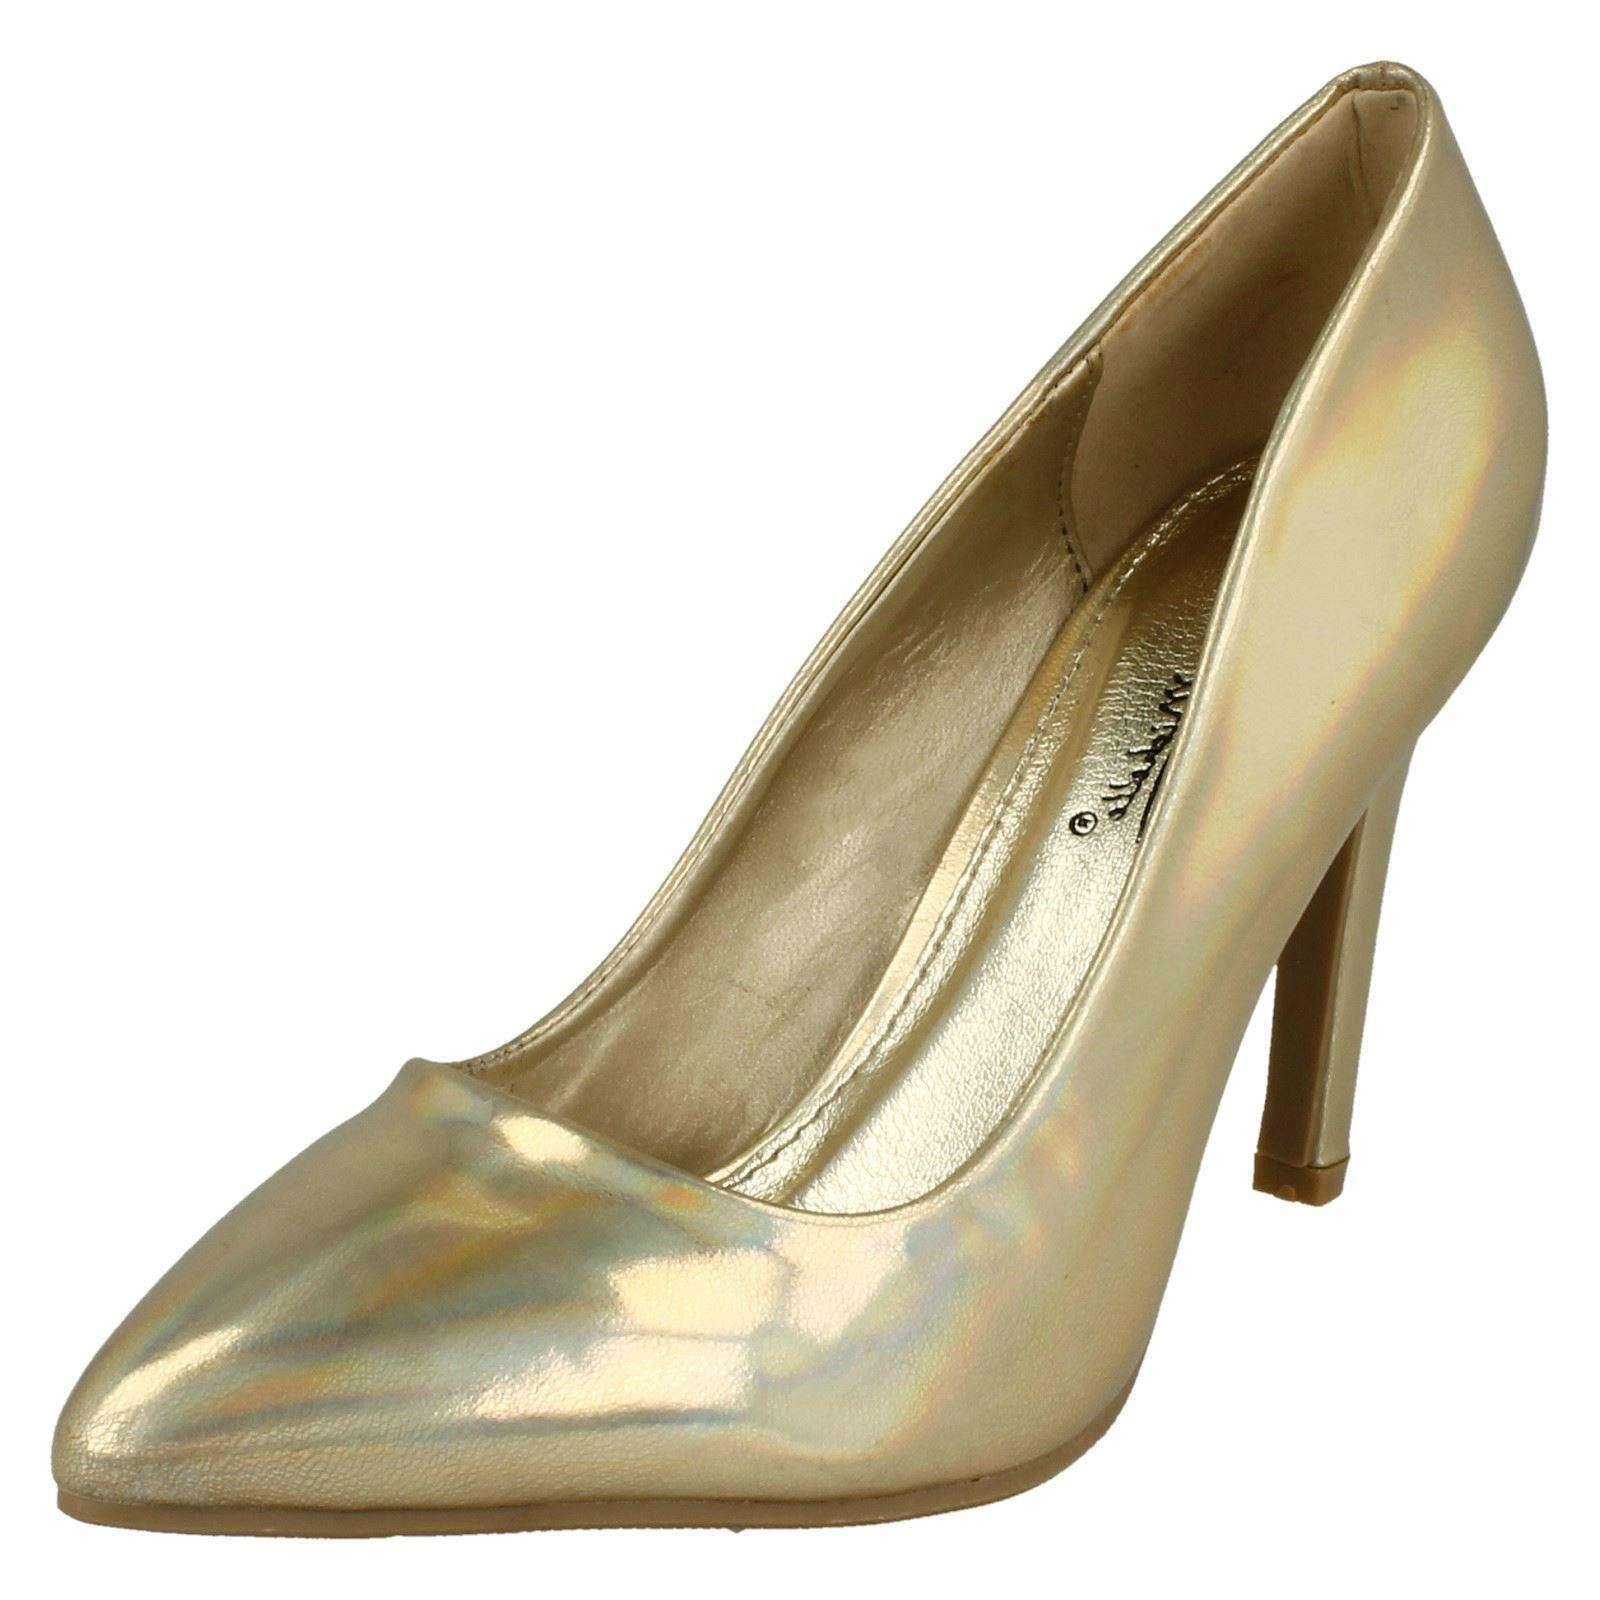 Femmes Métallique Ebay Cour Michelle 'chaussures' Anne O1Erq1